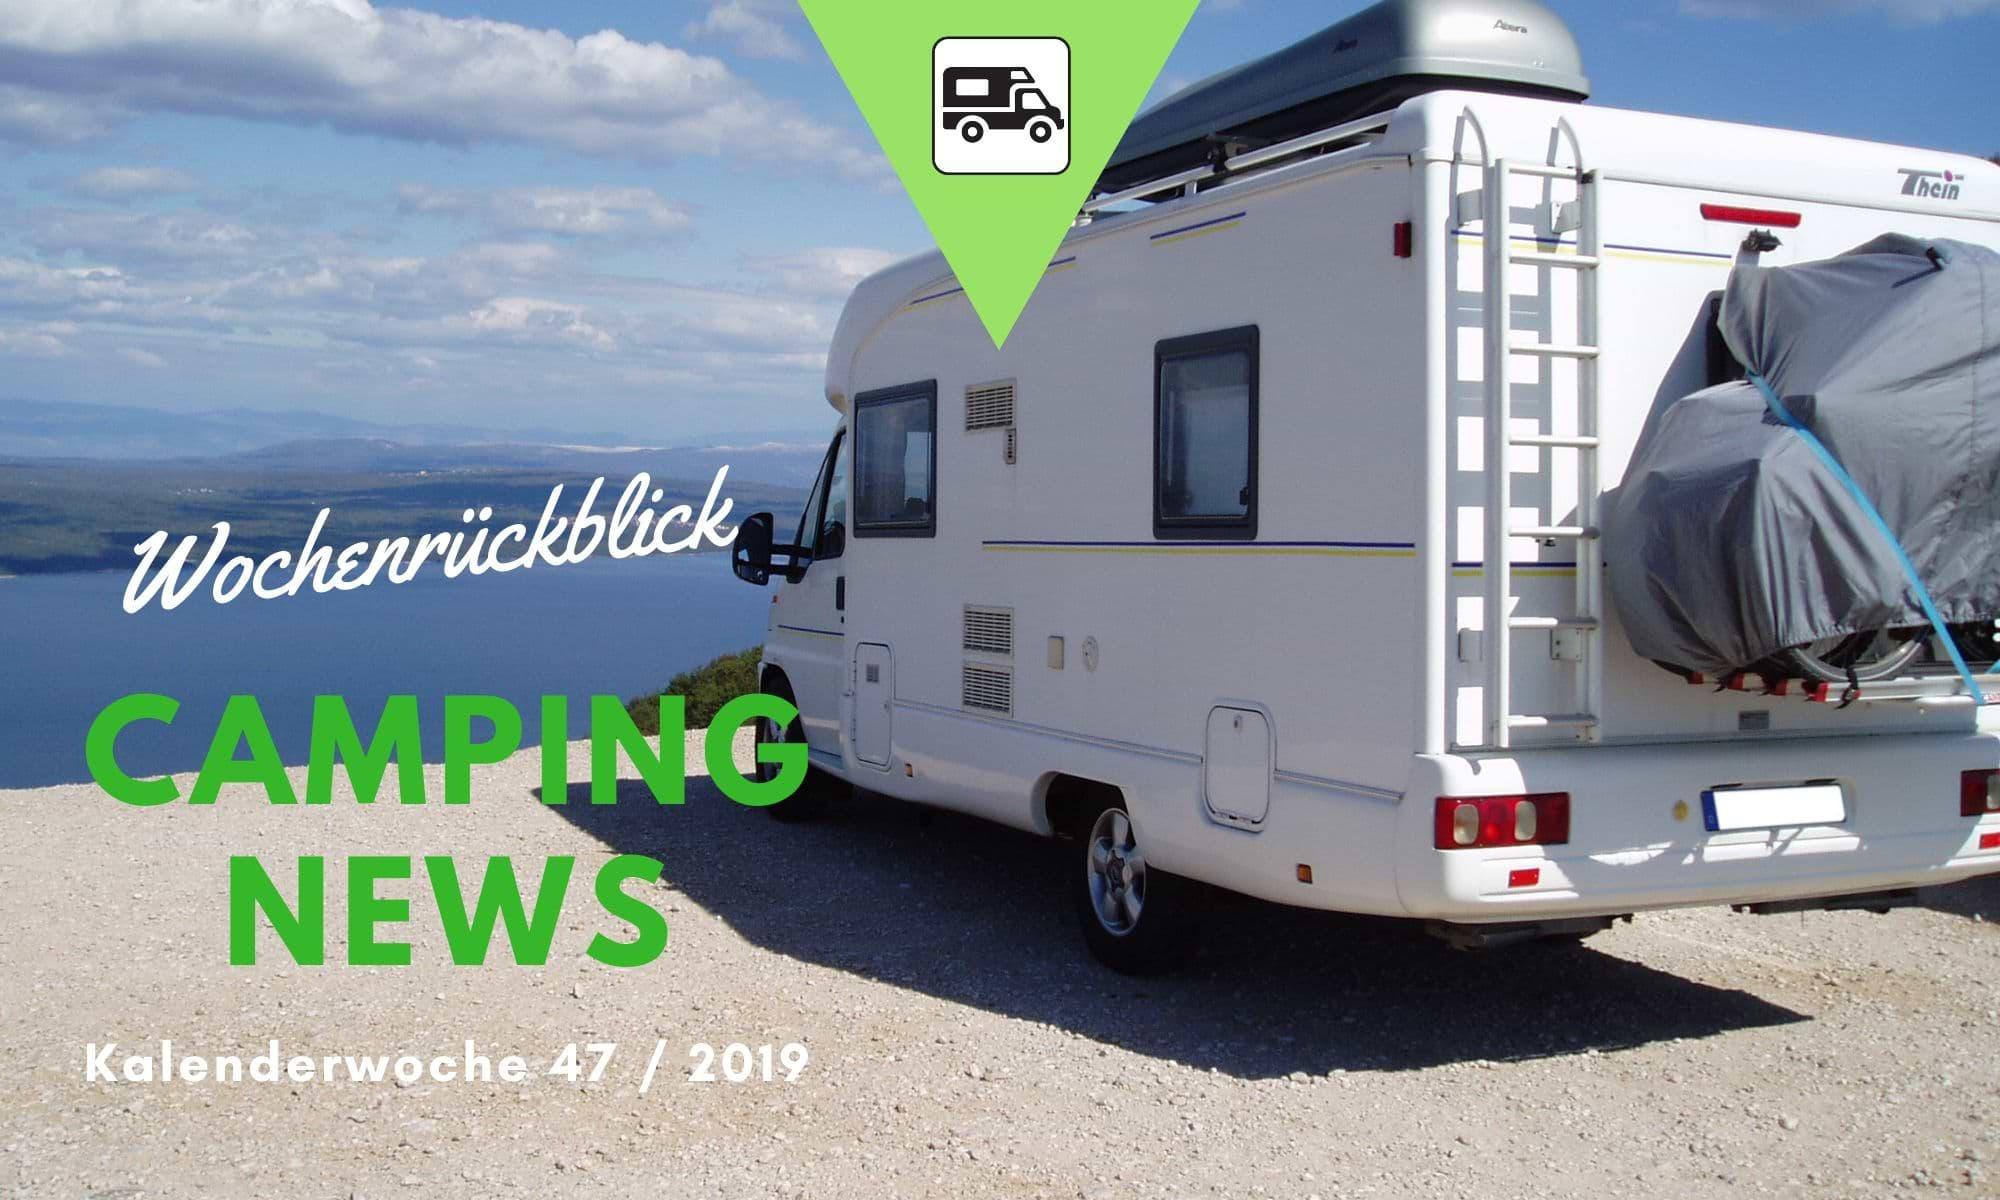 Wochenrückblick Camping News KW47-2019